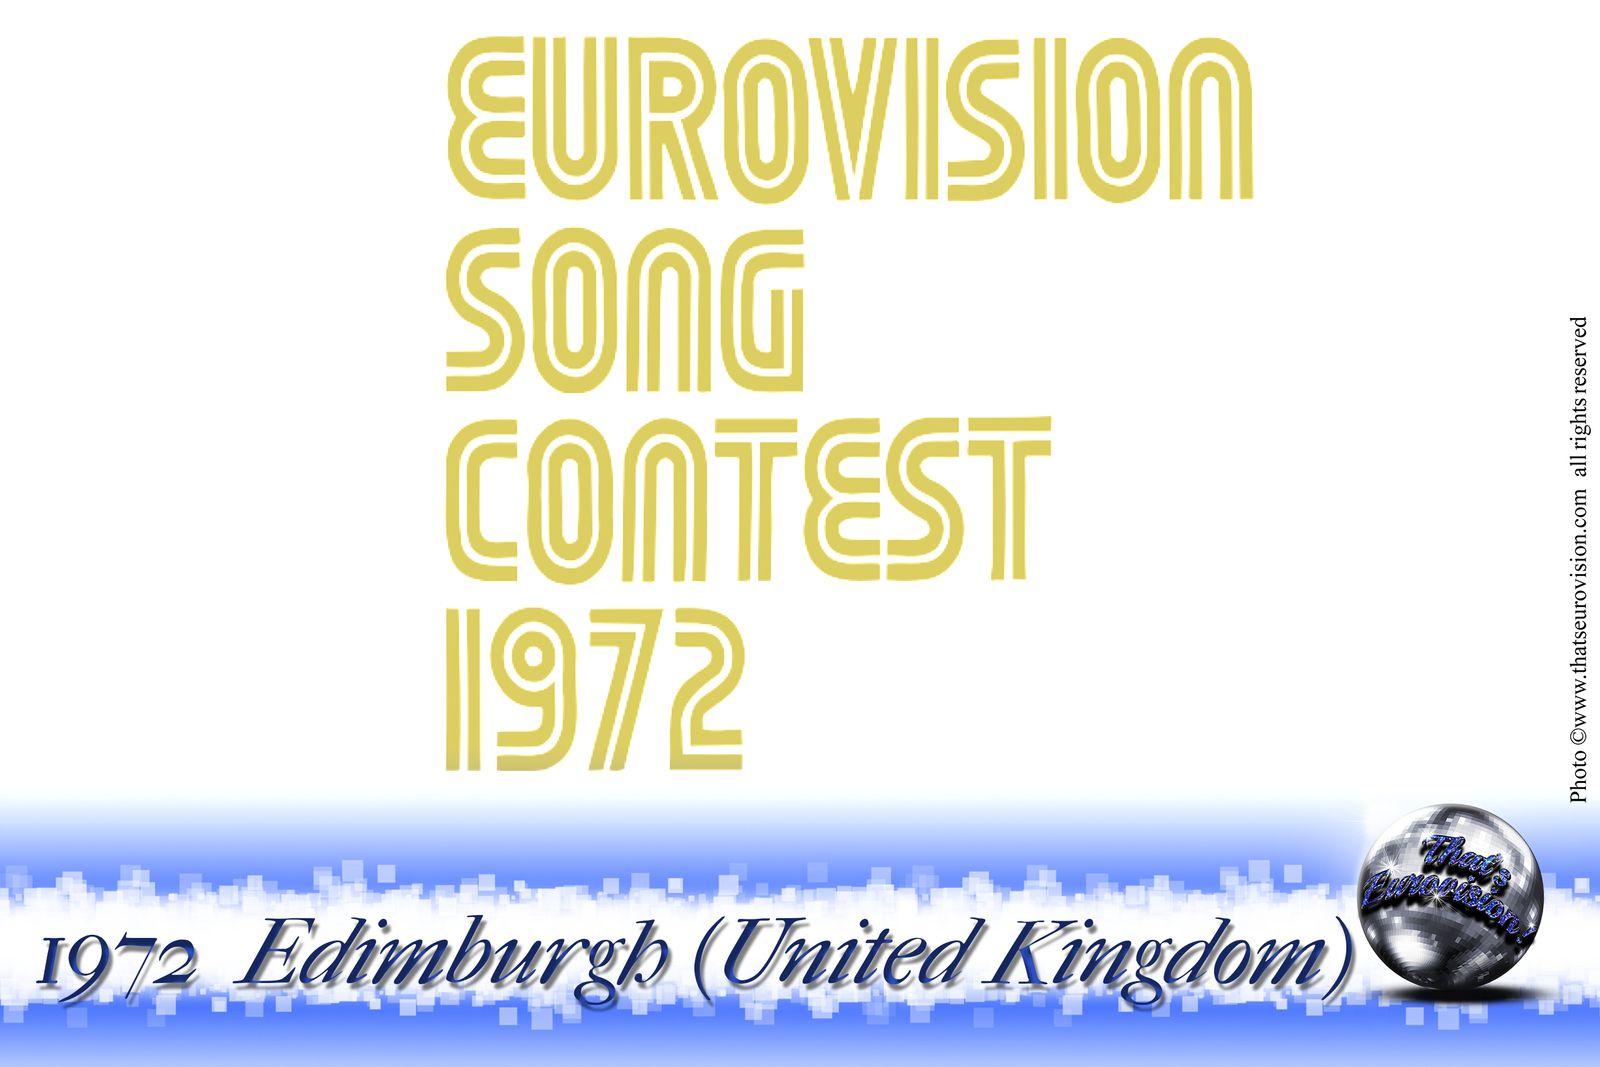 1972 - Edinburgh (United Kingdom)